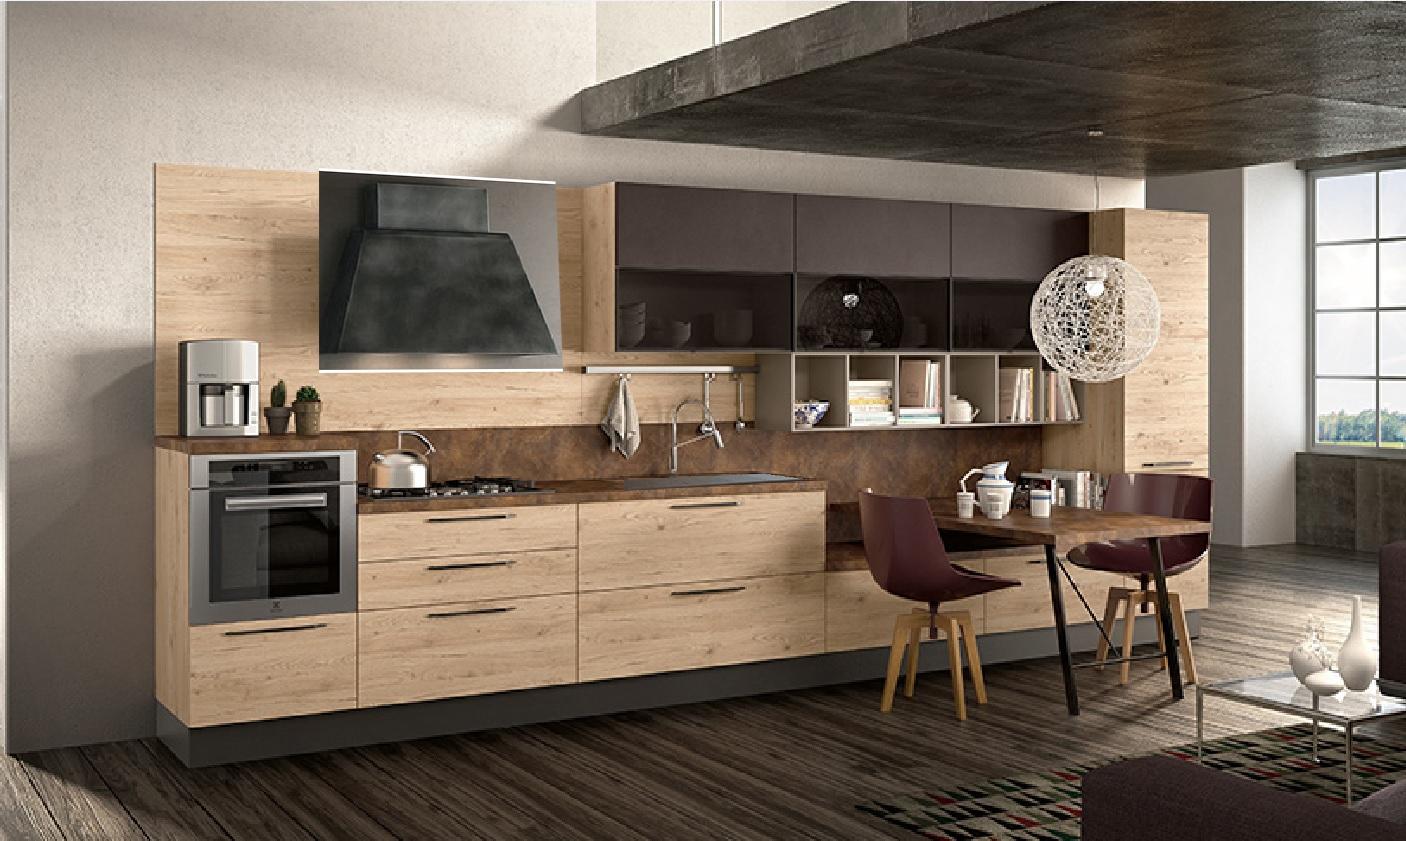 Cucina moderna industrial city urban in offerta outlet for Cucina in offerta